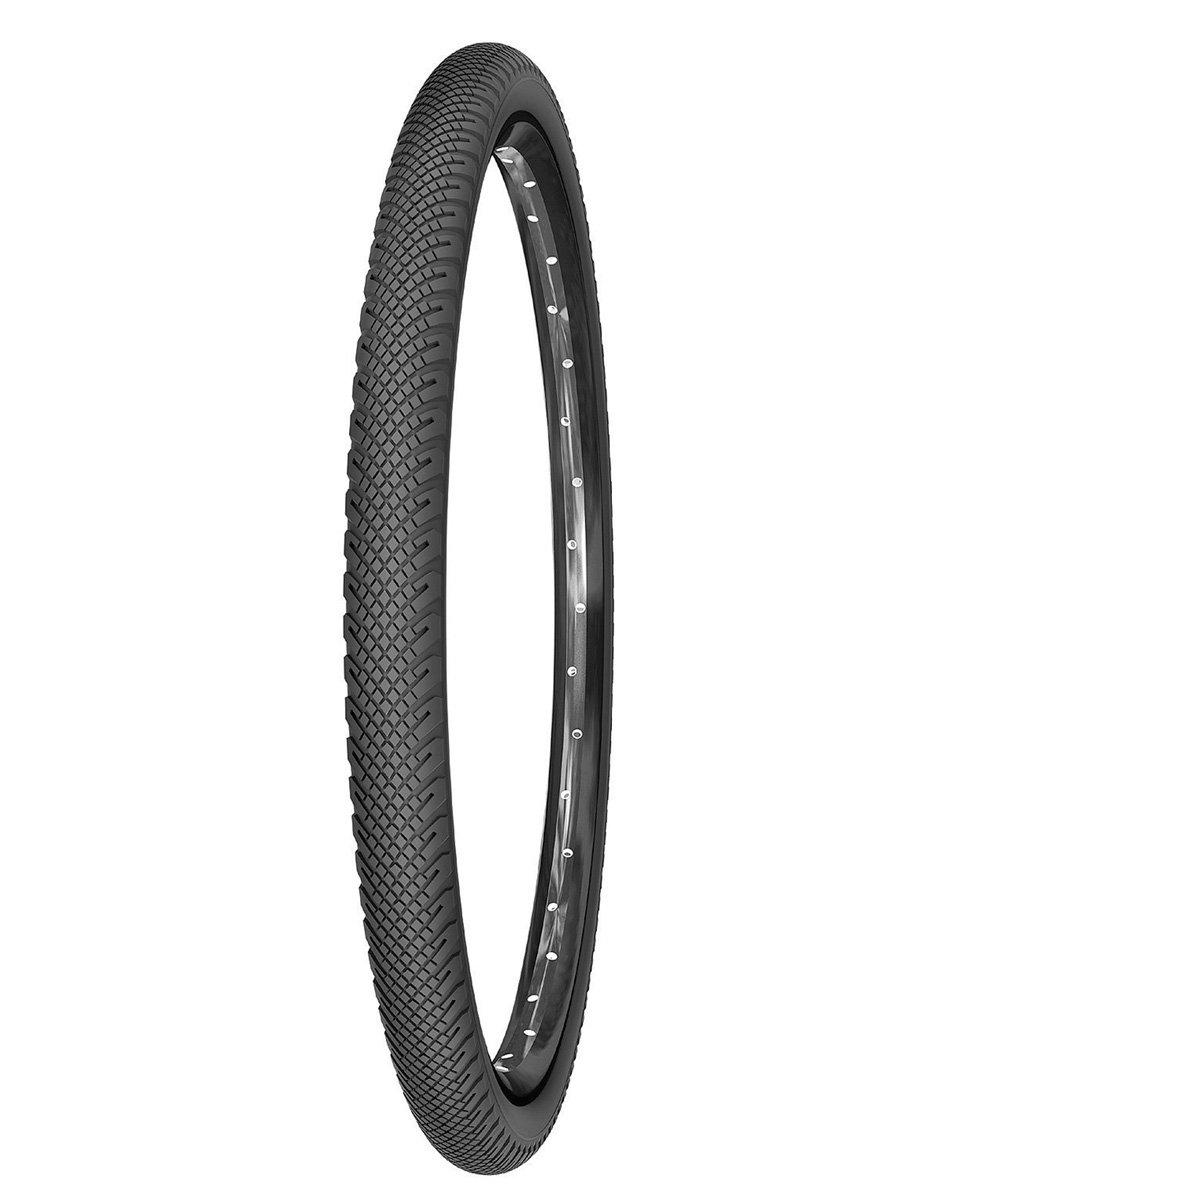 Michelin Country rock - Cubierta de bicicleta 26x1.75 Rock negra product image